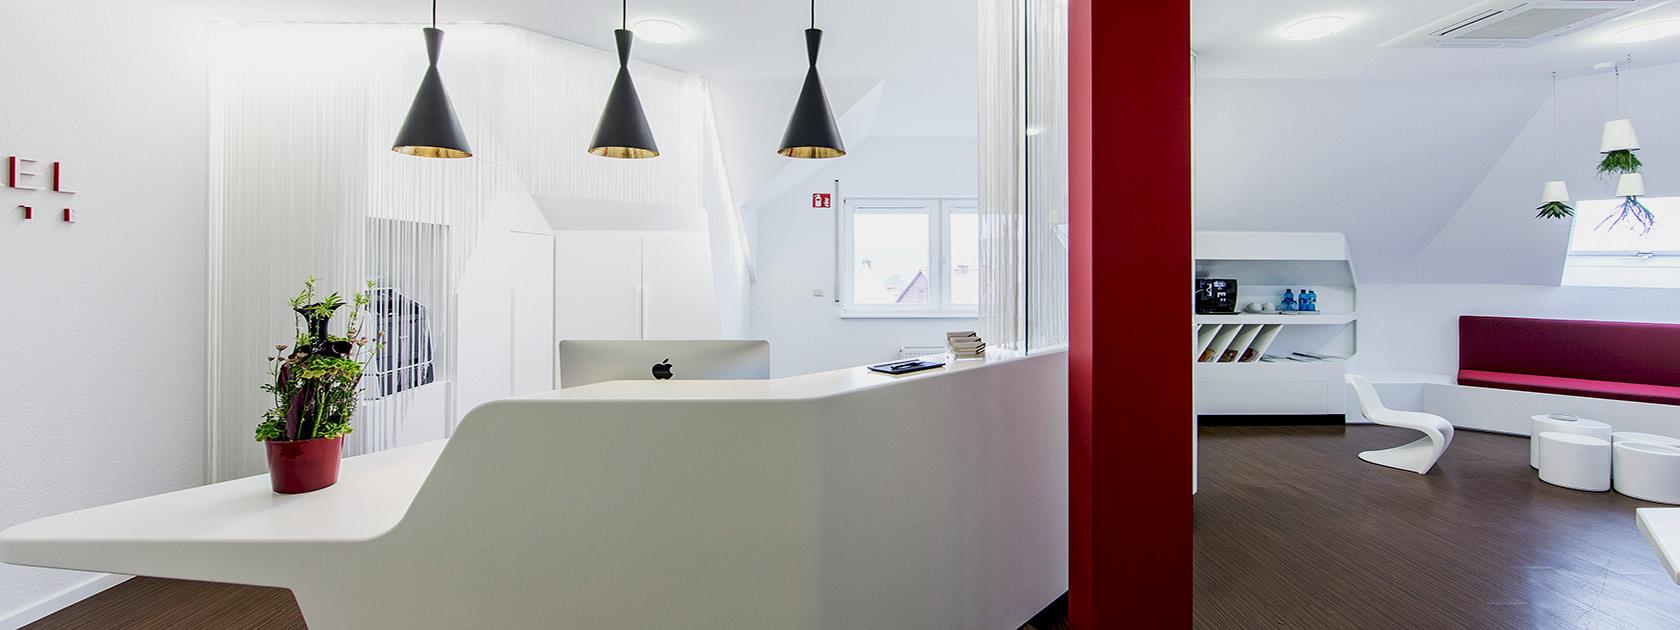 health care pfeiffer gmbh co kg. Black Bedroom Furniture Sets. Home Design Ideas